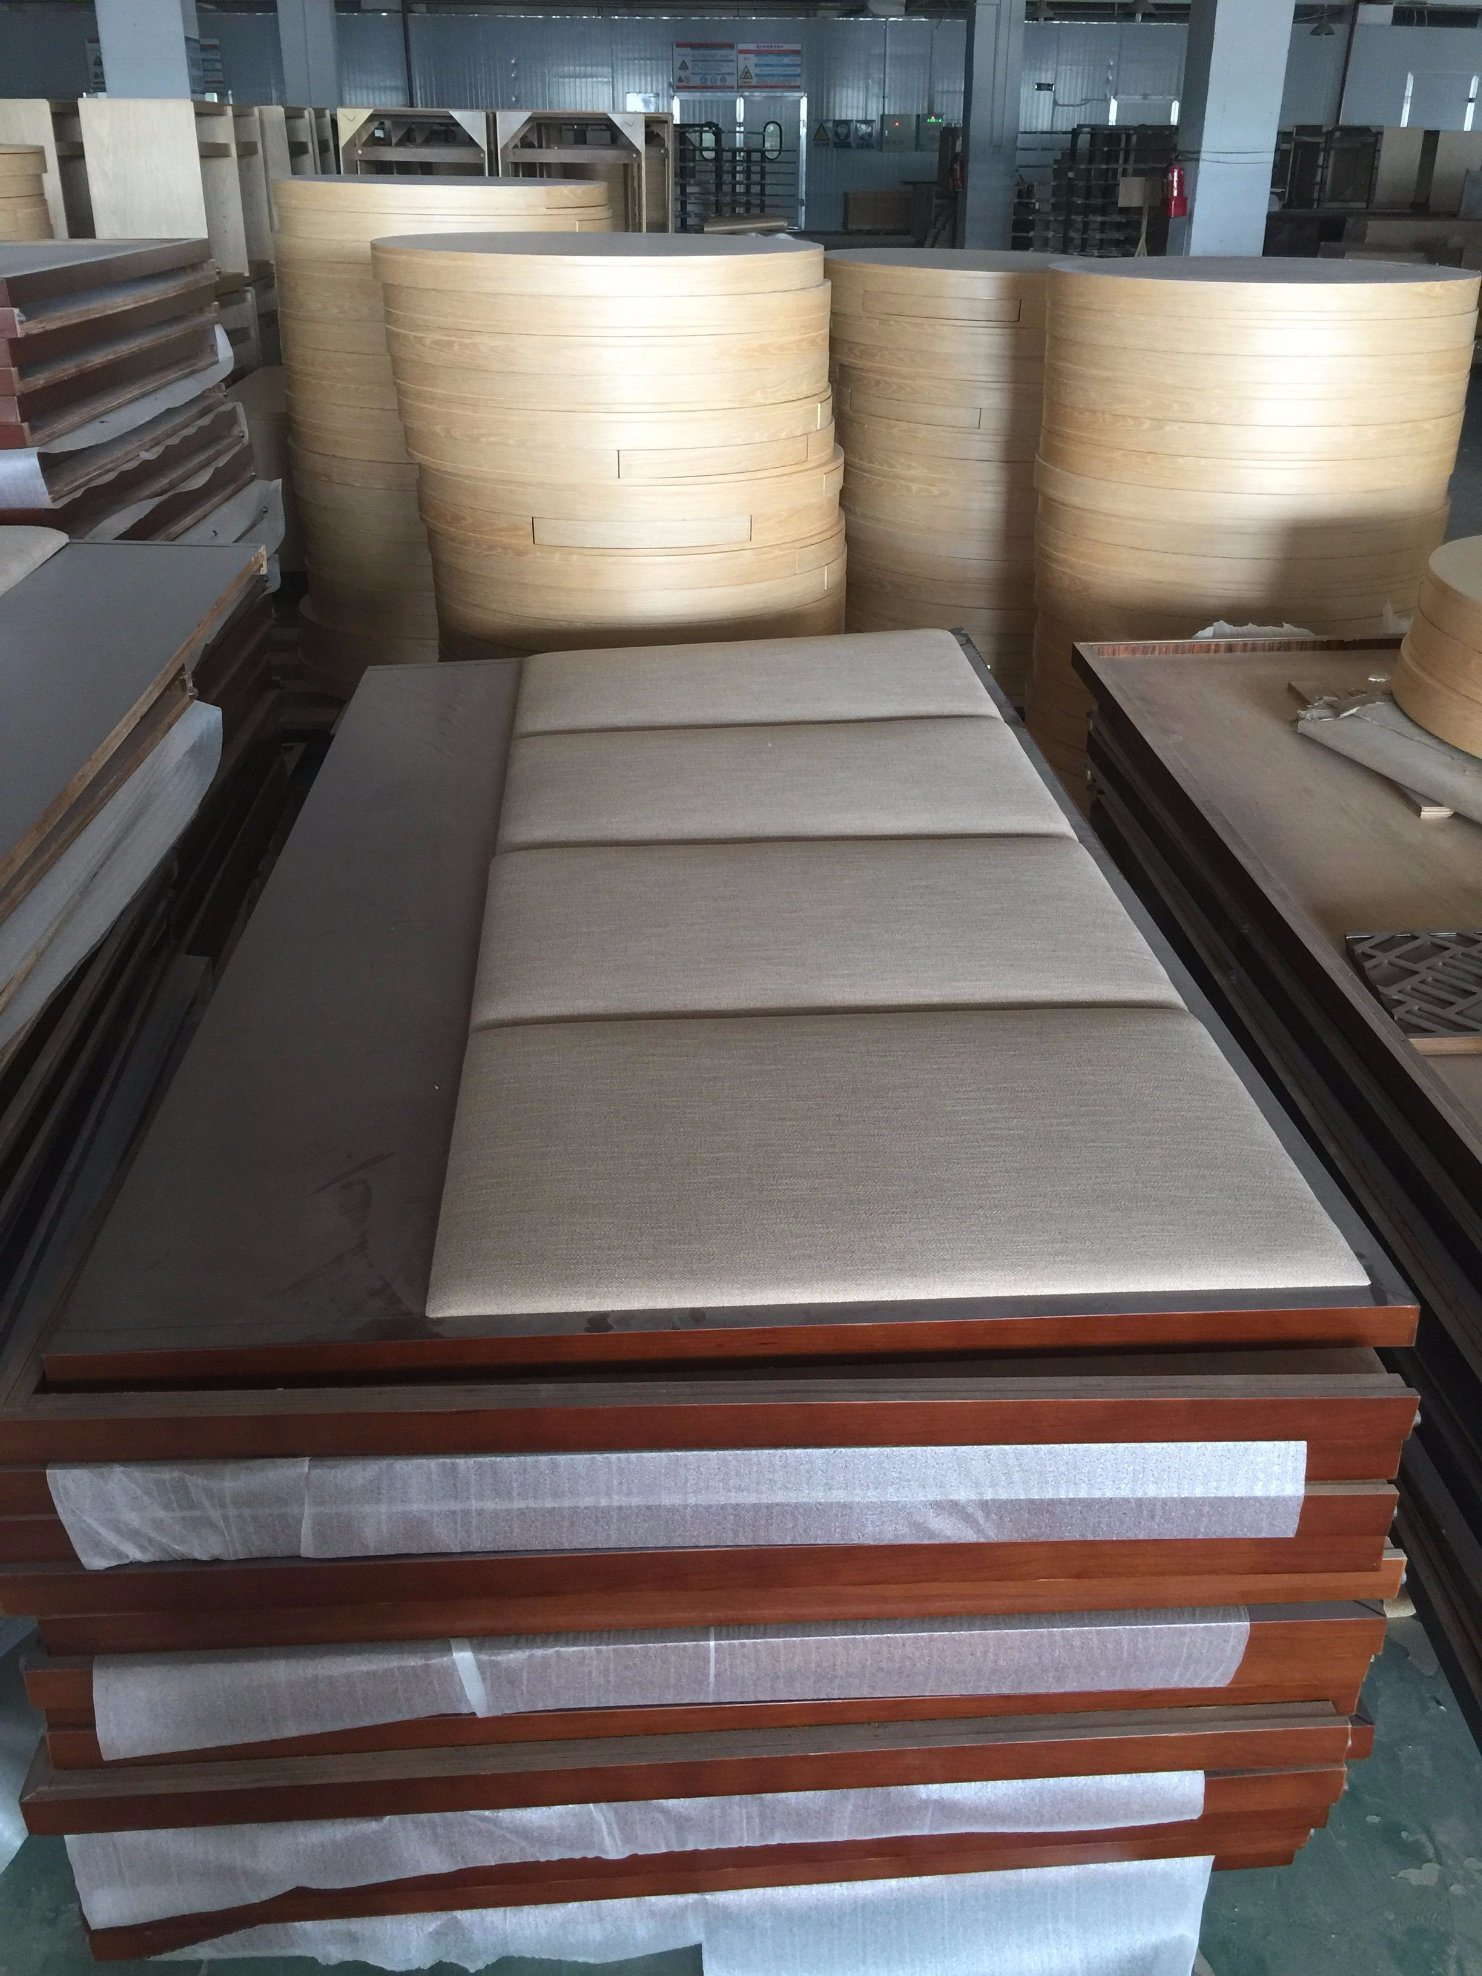 Hotel Furniture/Luxury King Size Hotel Bedroom Furniture/Restaurant Furniture/Double Hospitality Guest Room Furniture (GLB-0109816)